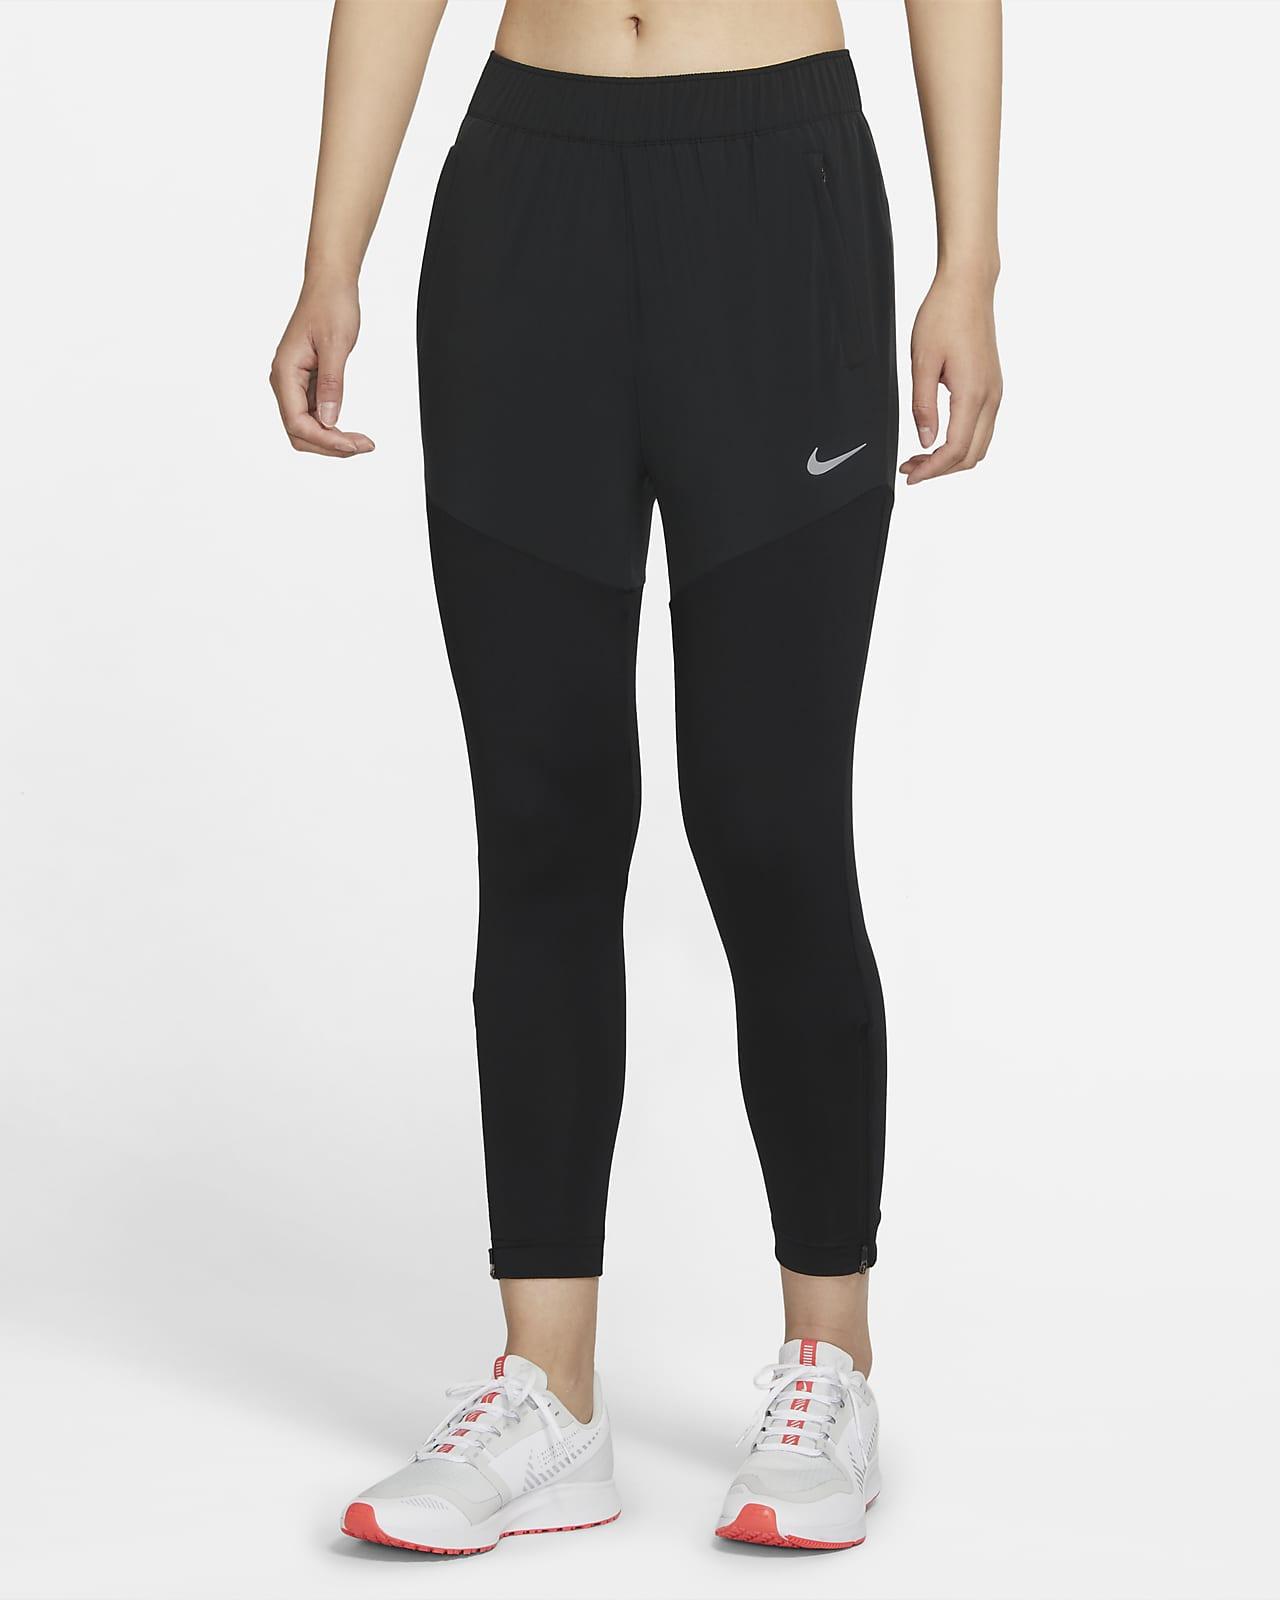 Nike Dri-FIT Essential 女款跑步長褲